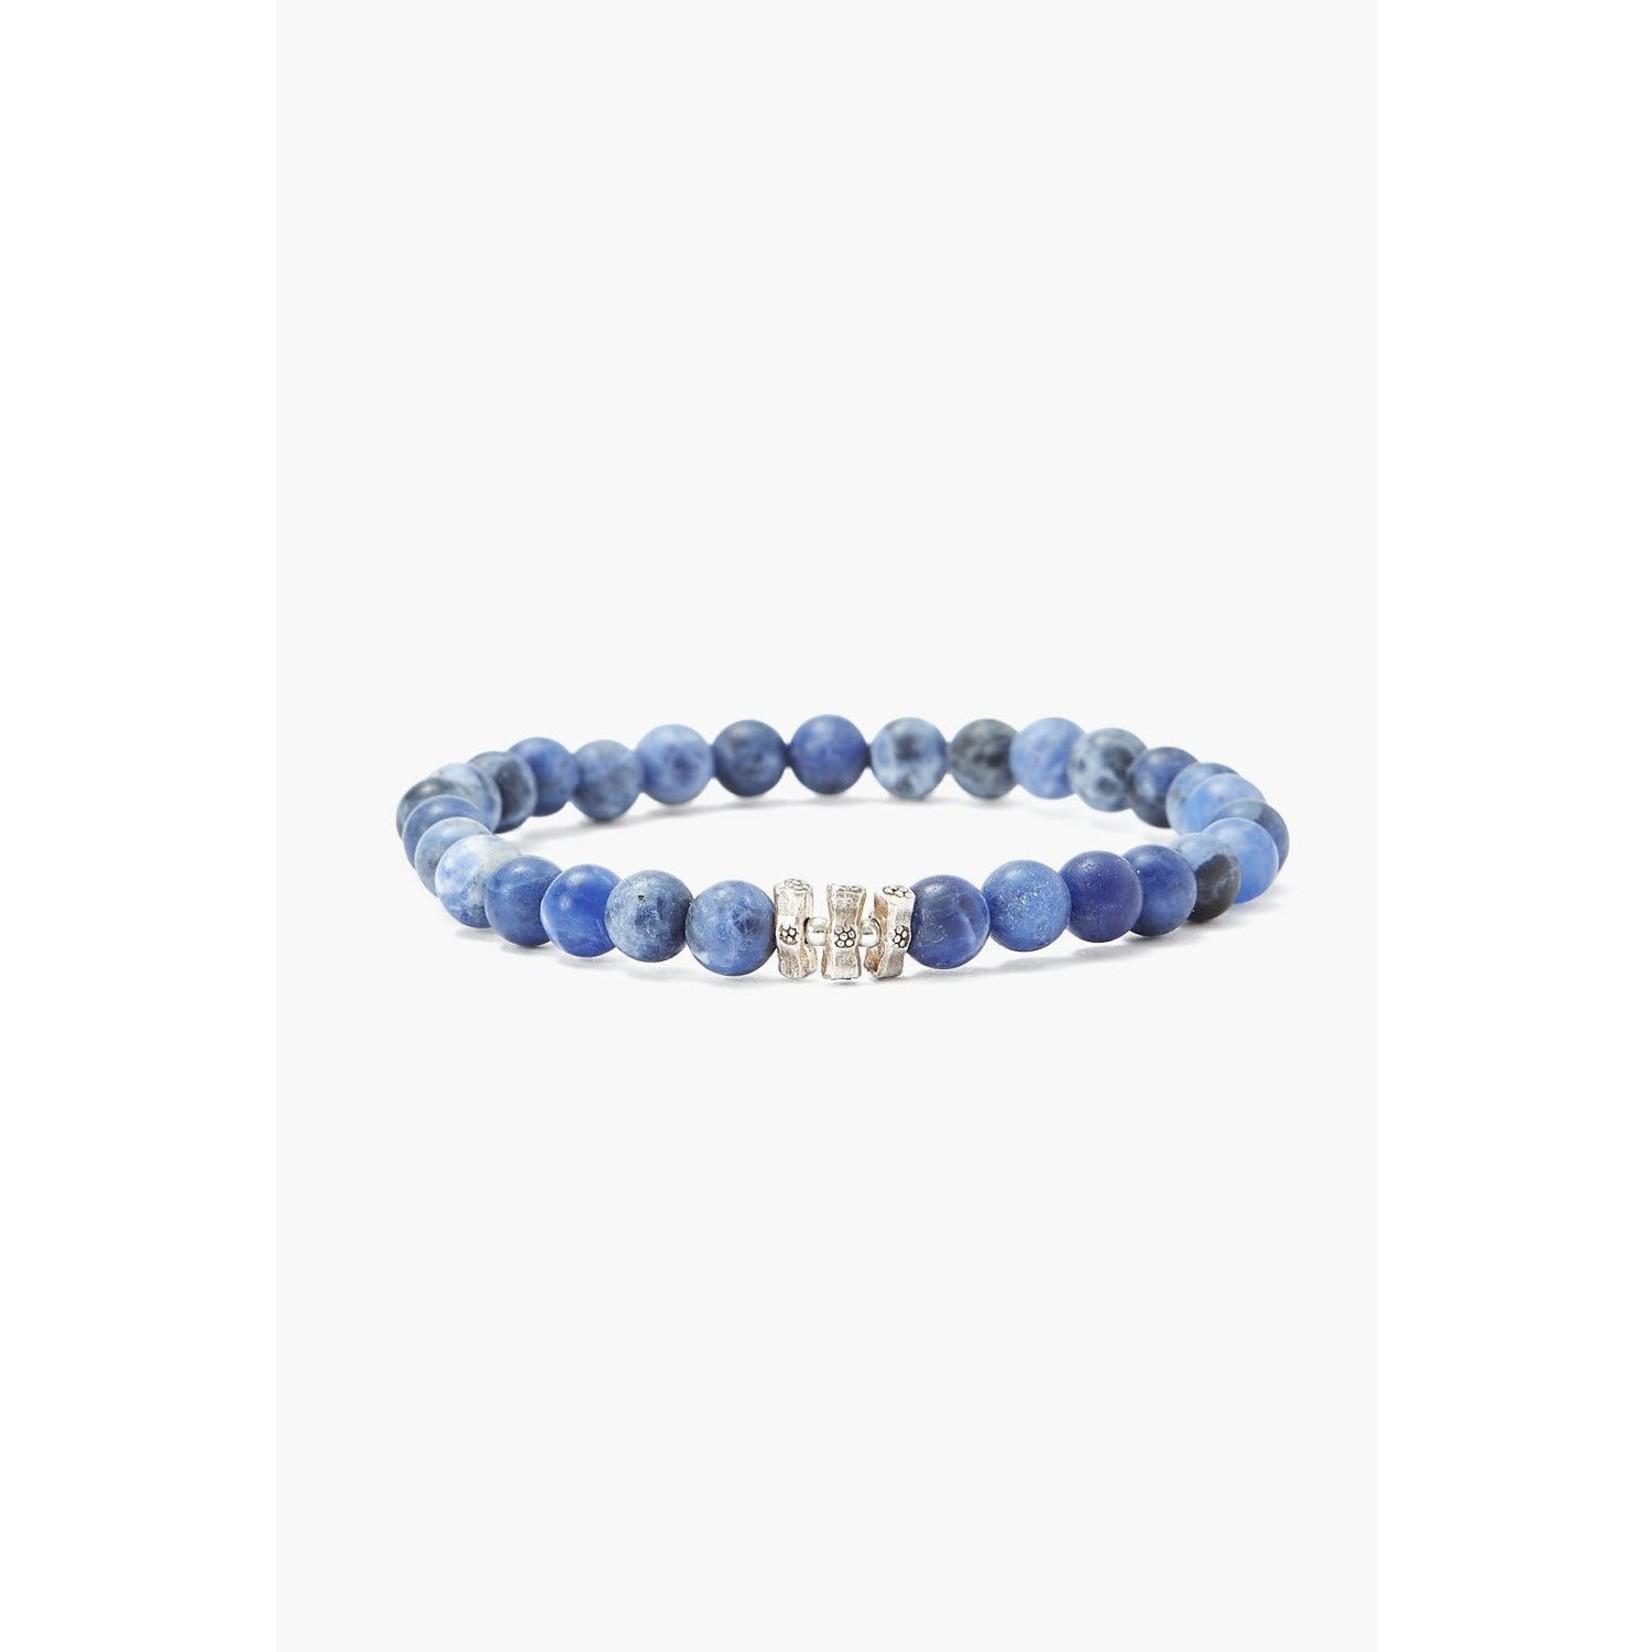 Chan Luu Etched Silver Stretch Bracelet